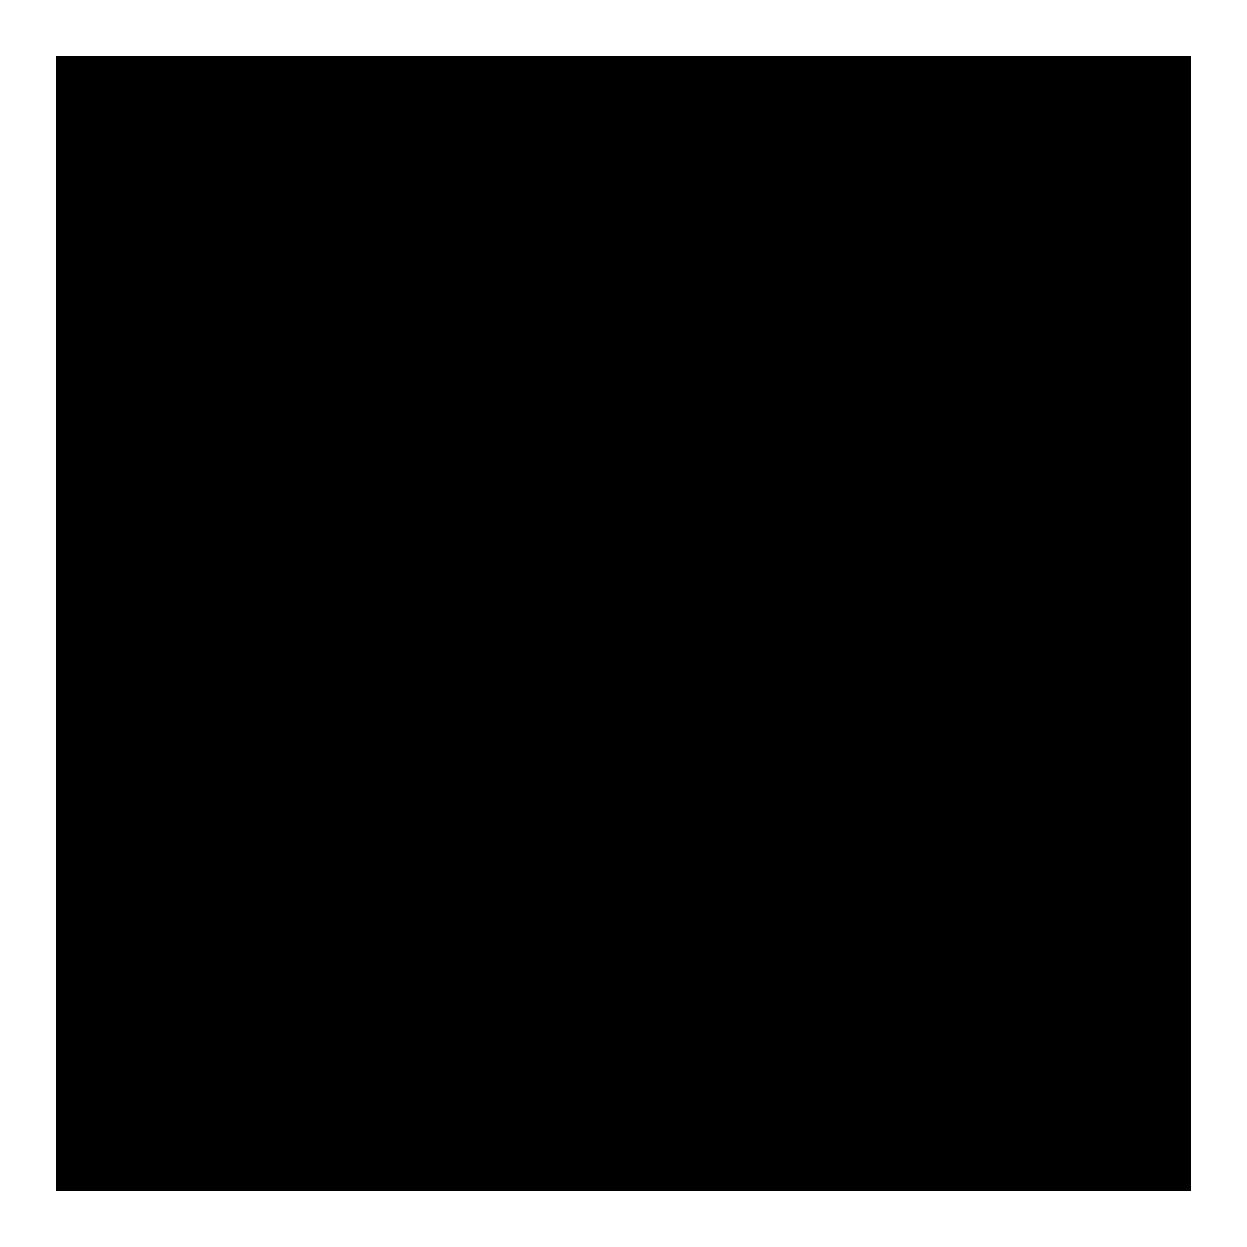 DFB-Adler_Logo_RGB_1C_Black.png